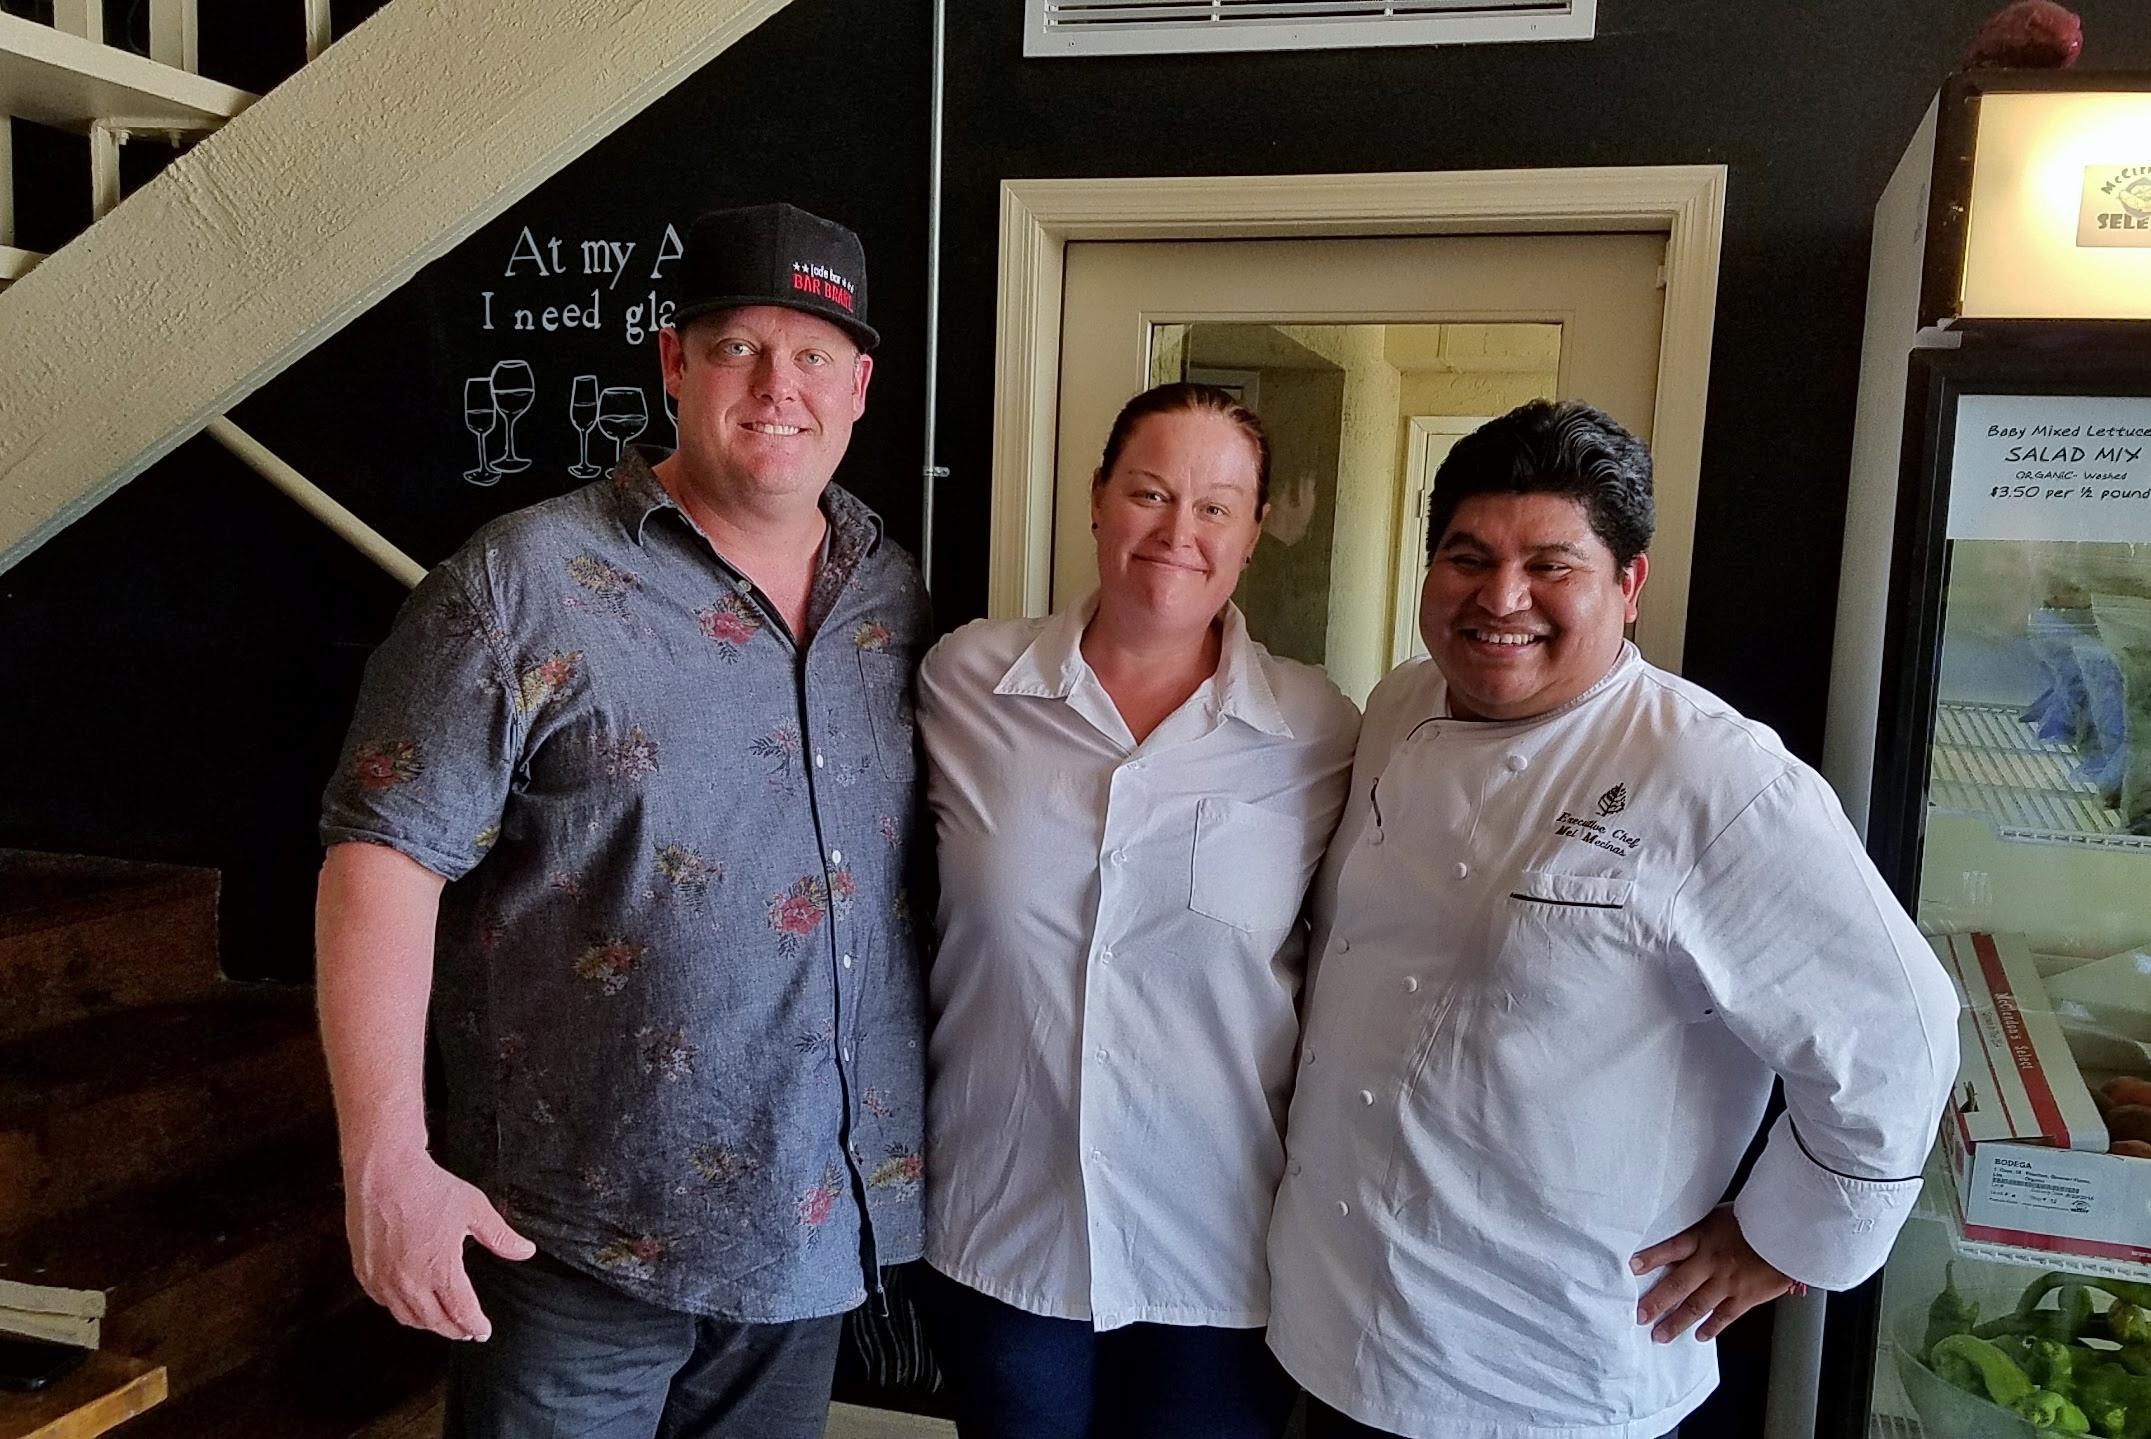 Chef MacMillan, Chef Badman, and Chef Mel Mecinas